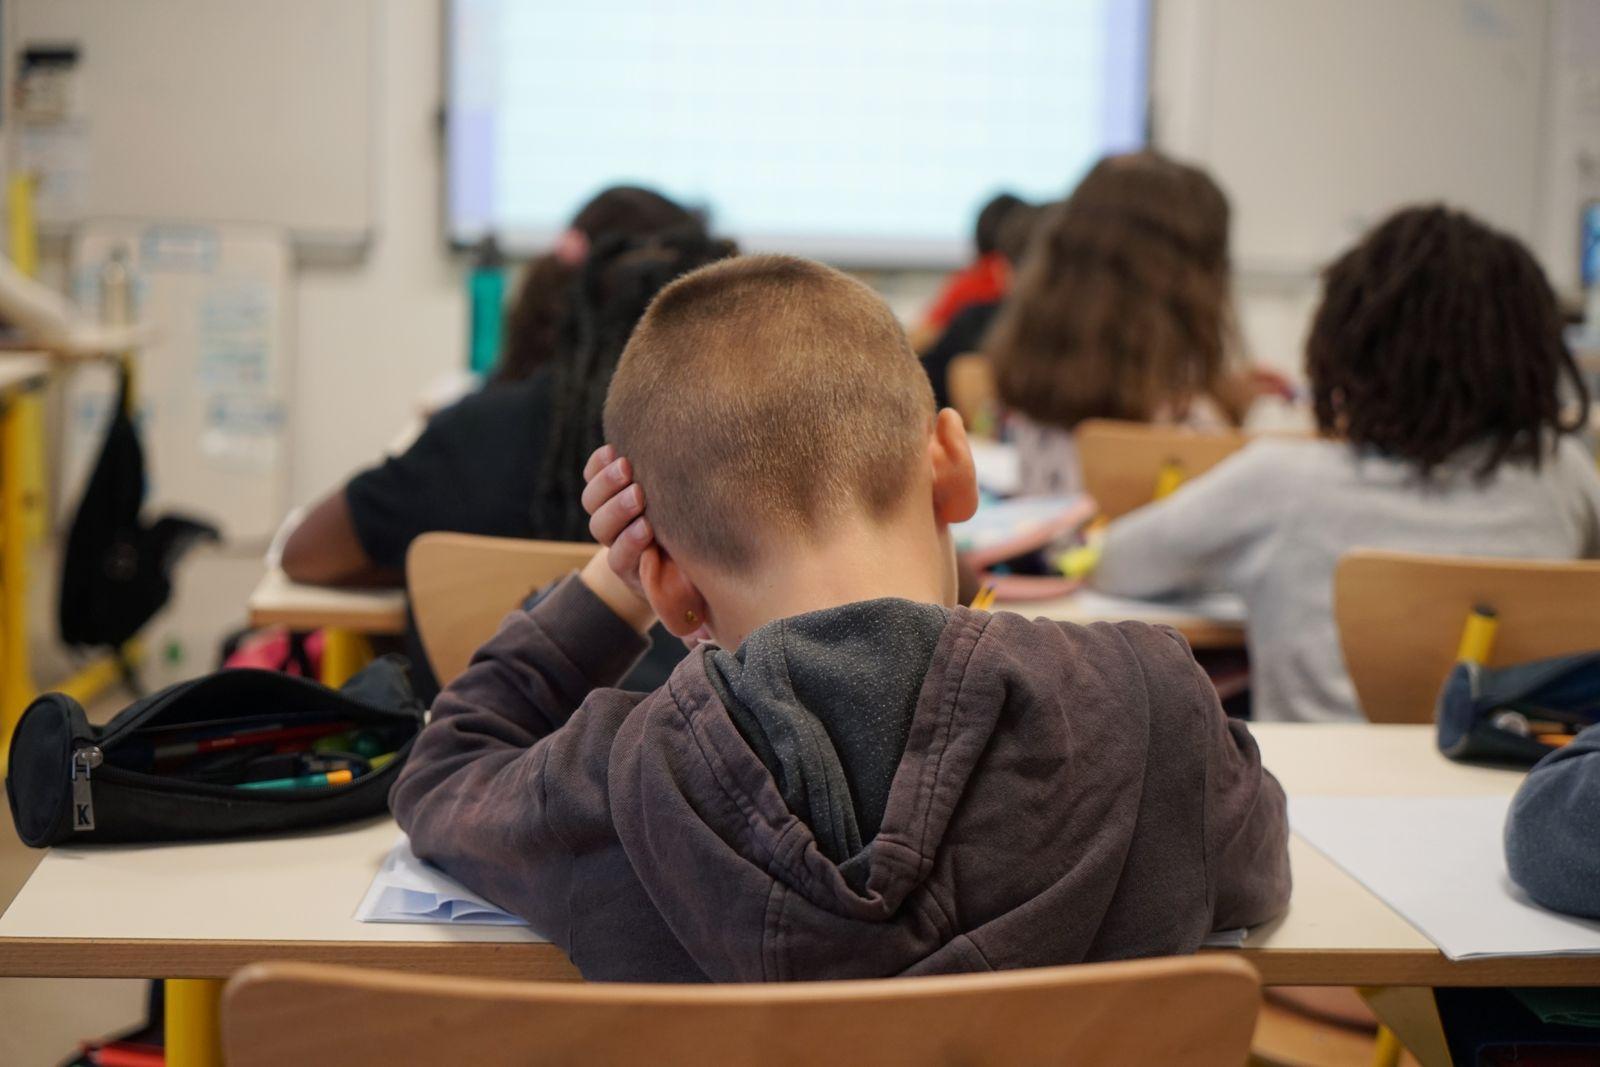 Grundschulklasse